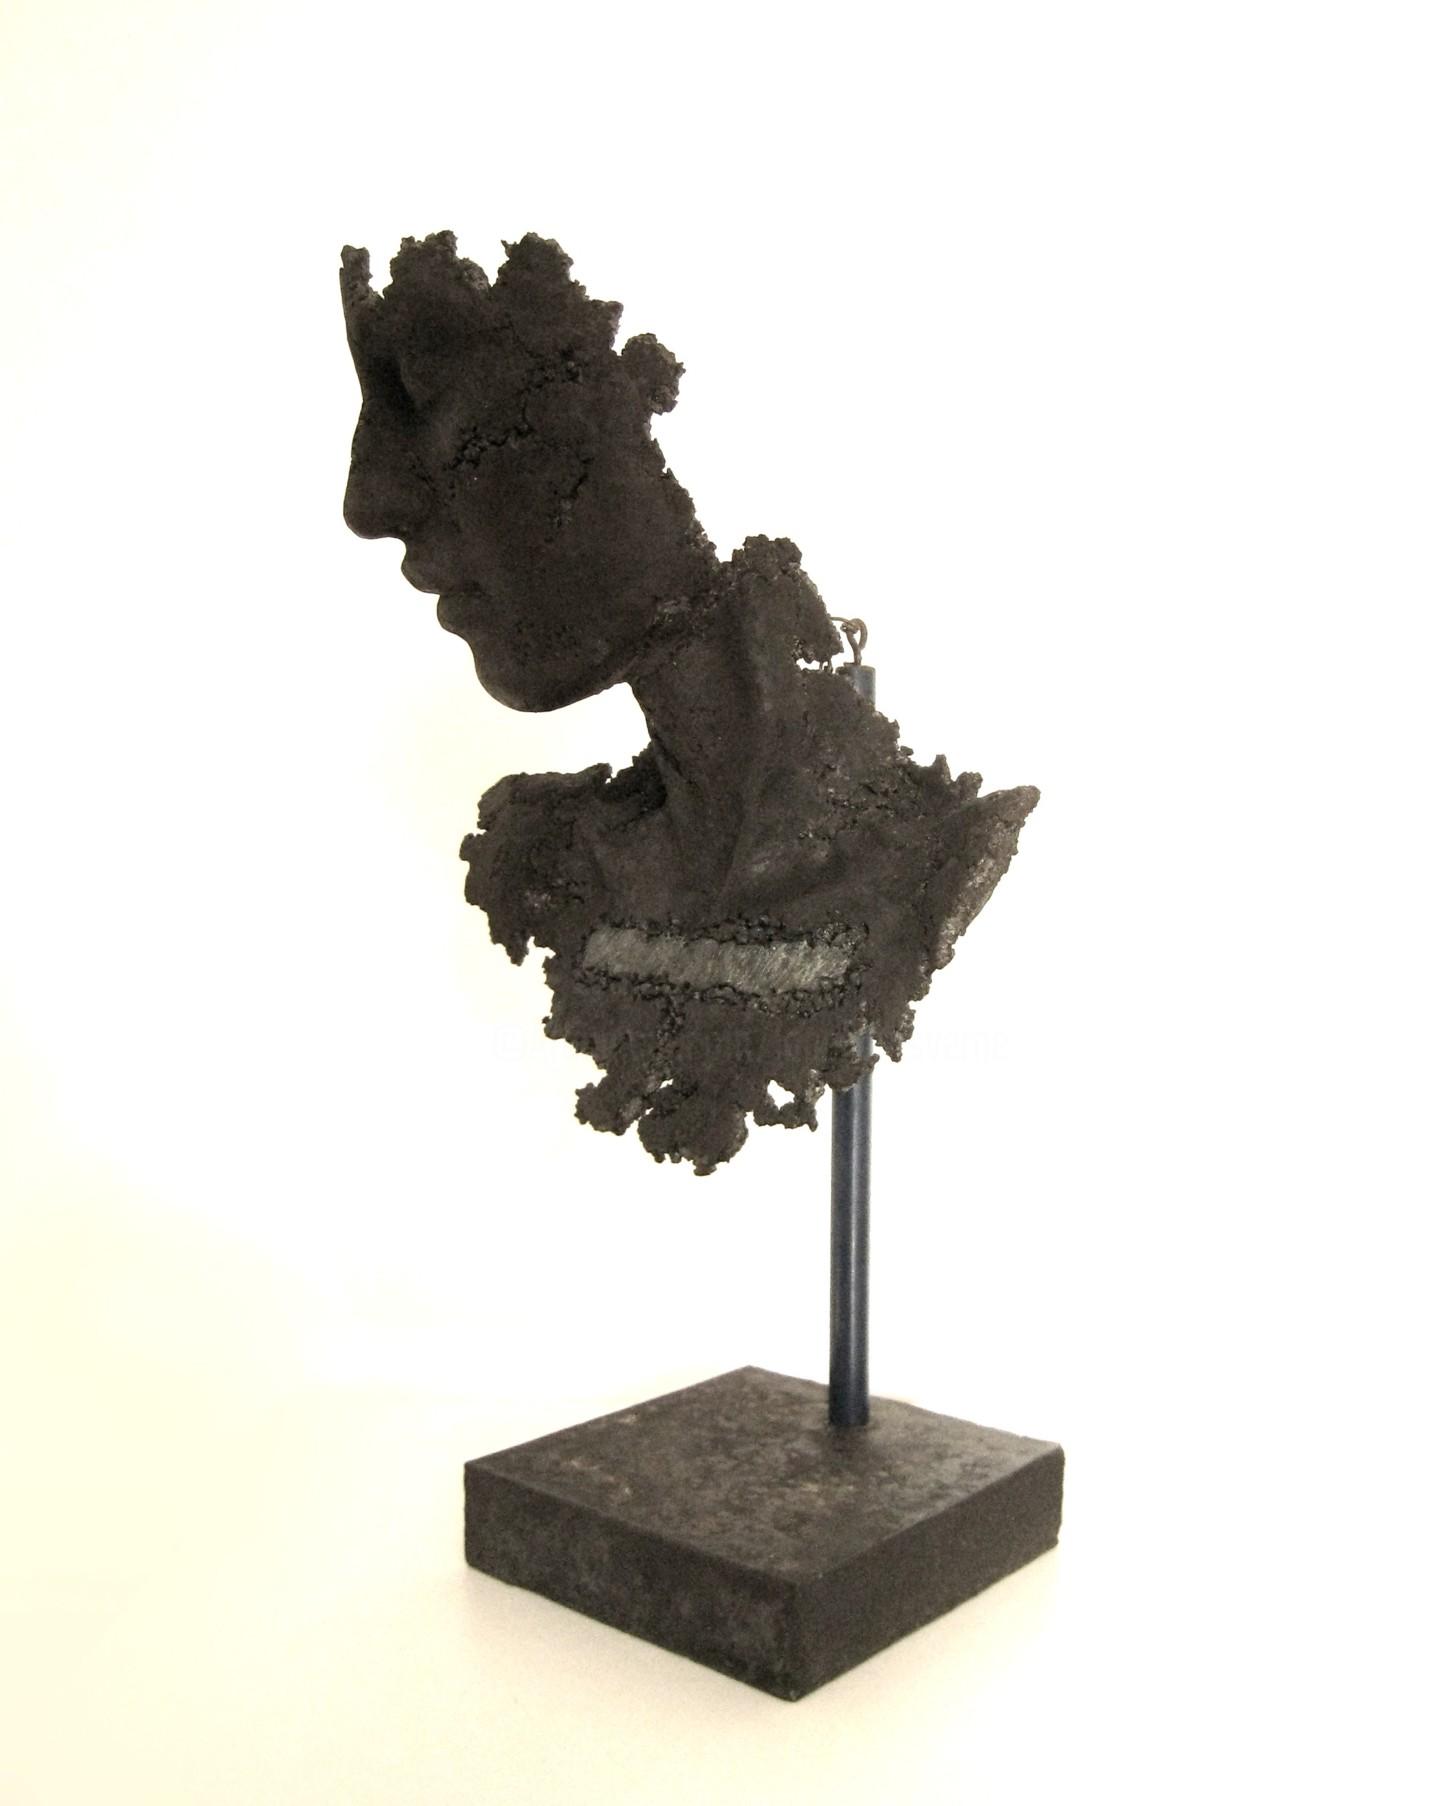 JEAN-YVES VERNE - concrete bust